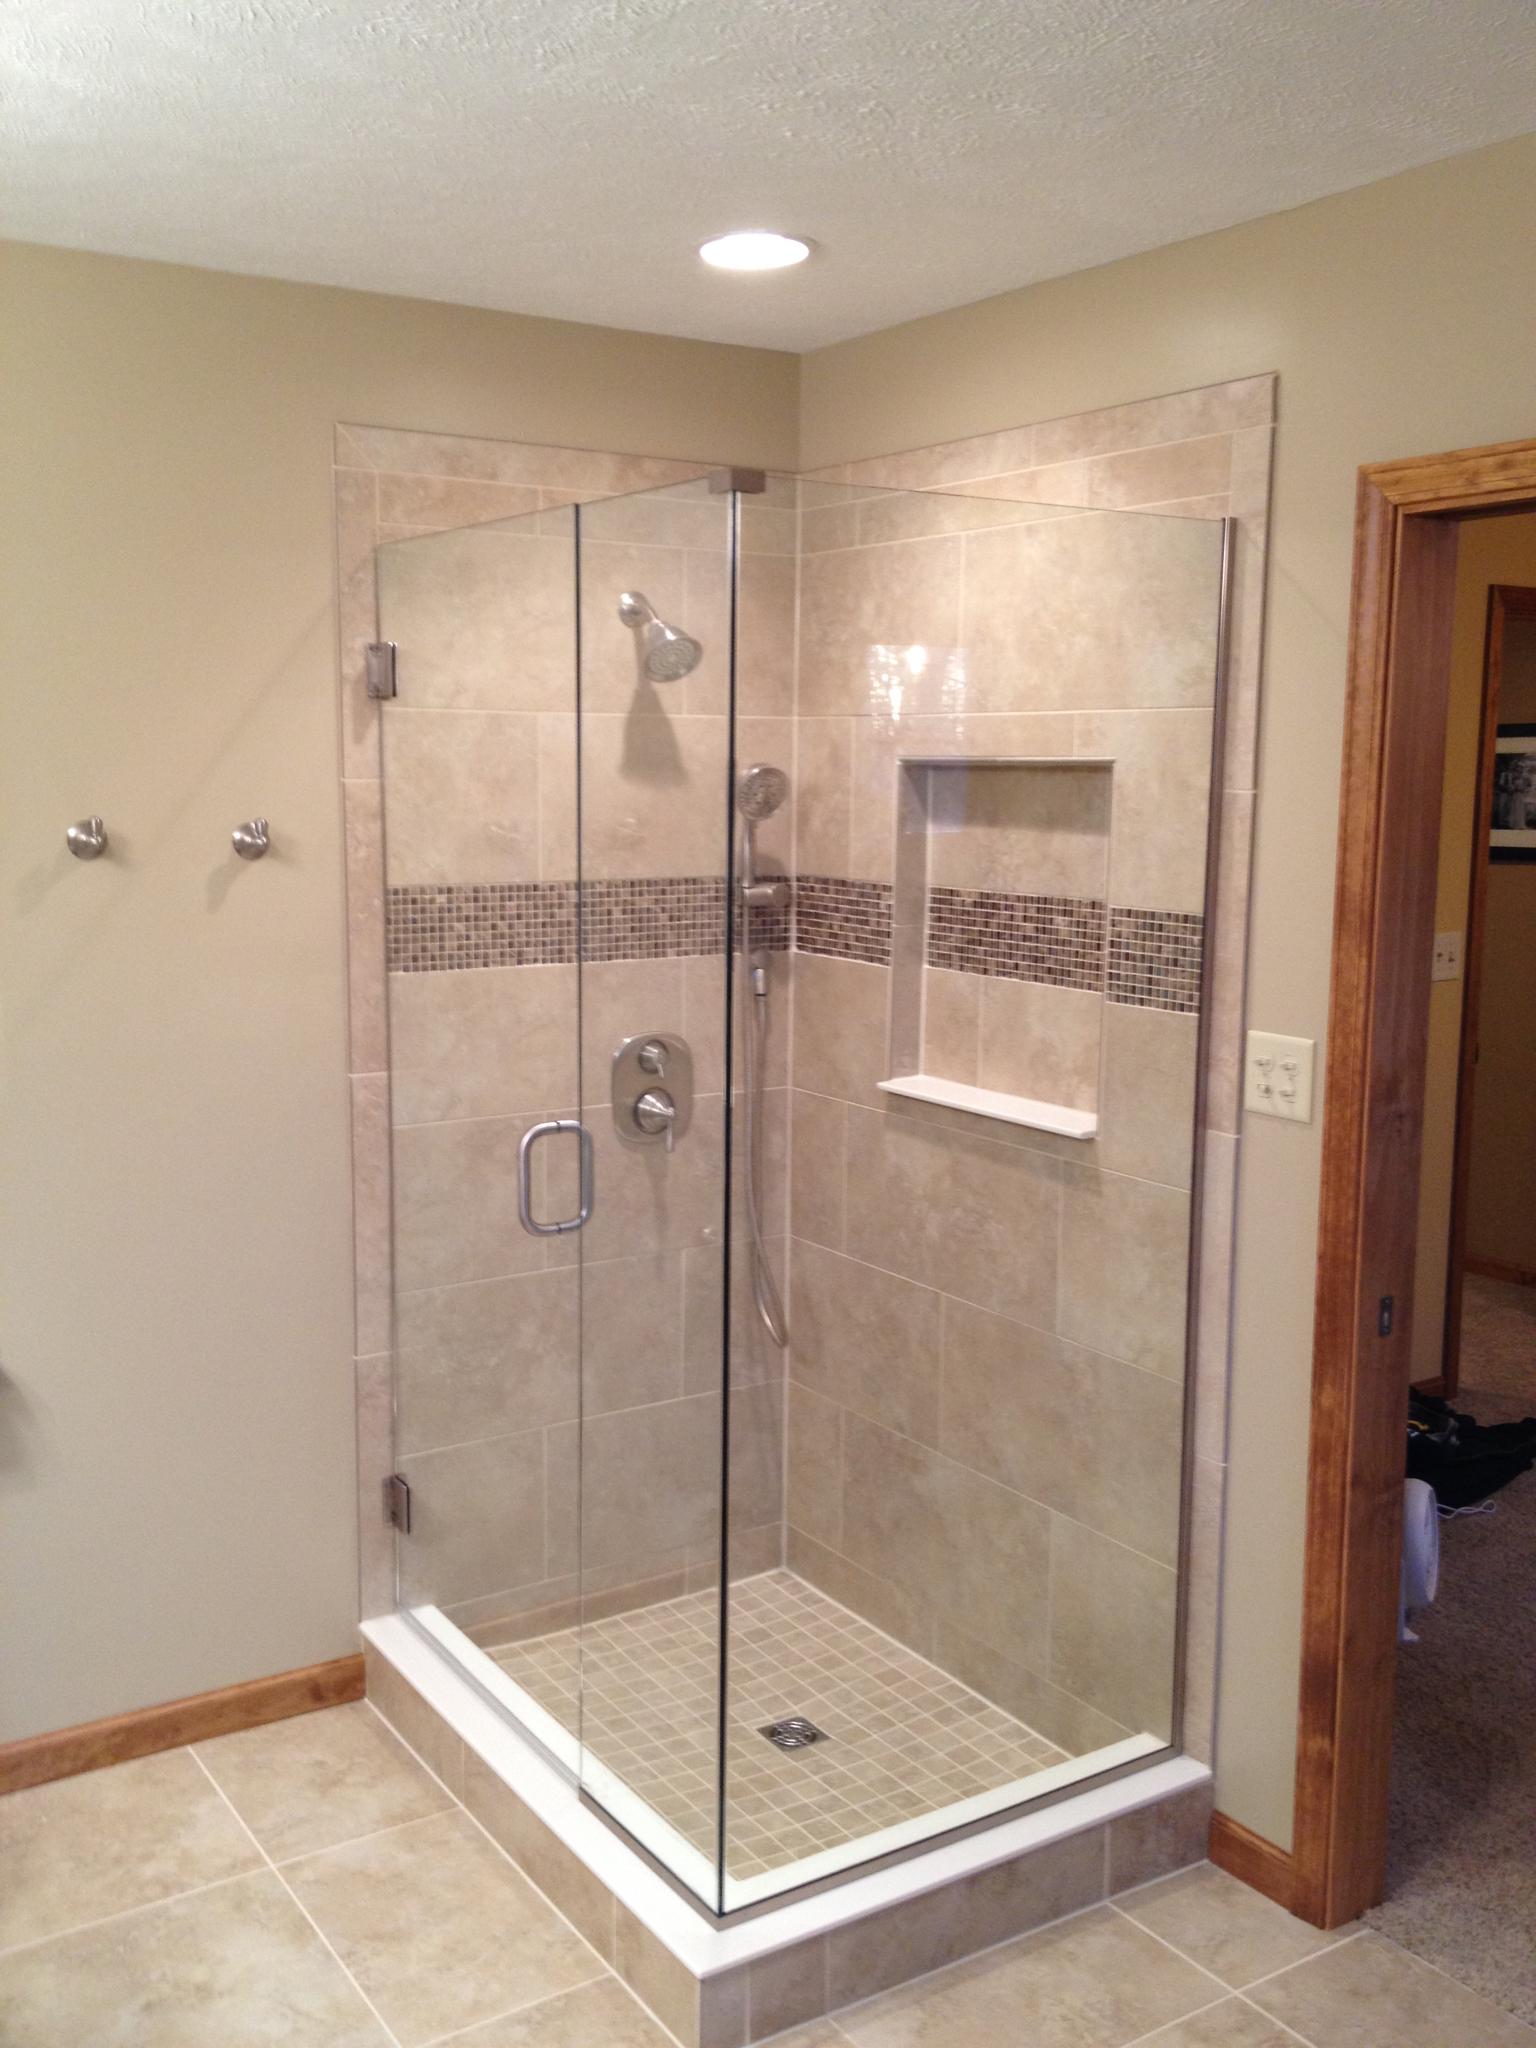 Bathroom Remodel Evansville In bathroom remodeling evansville indiana : brightpulse